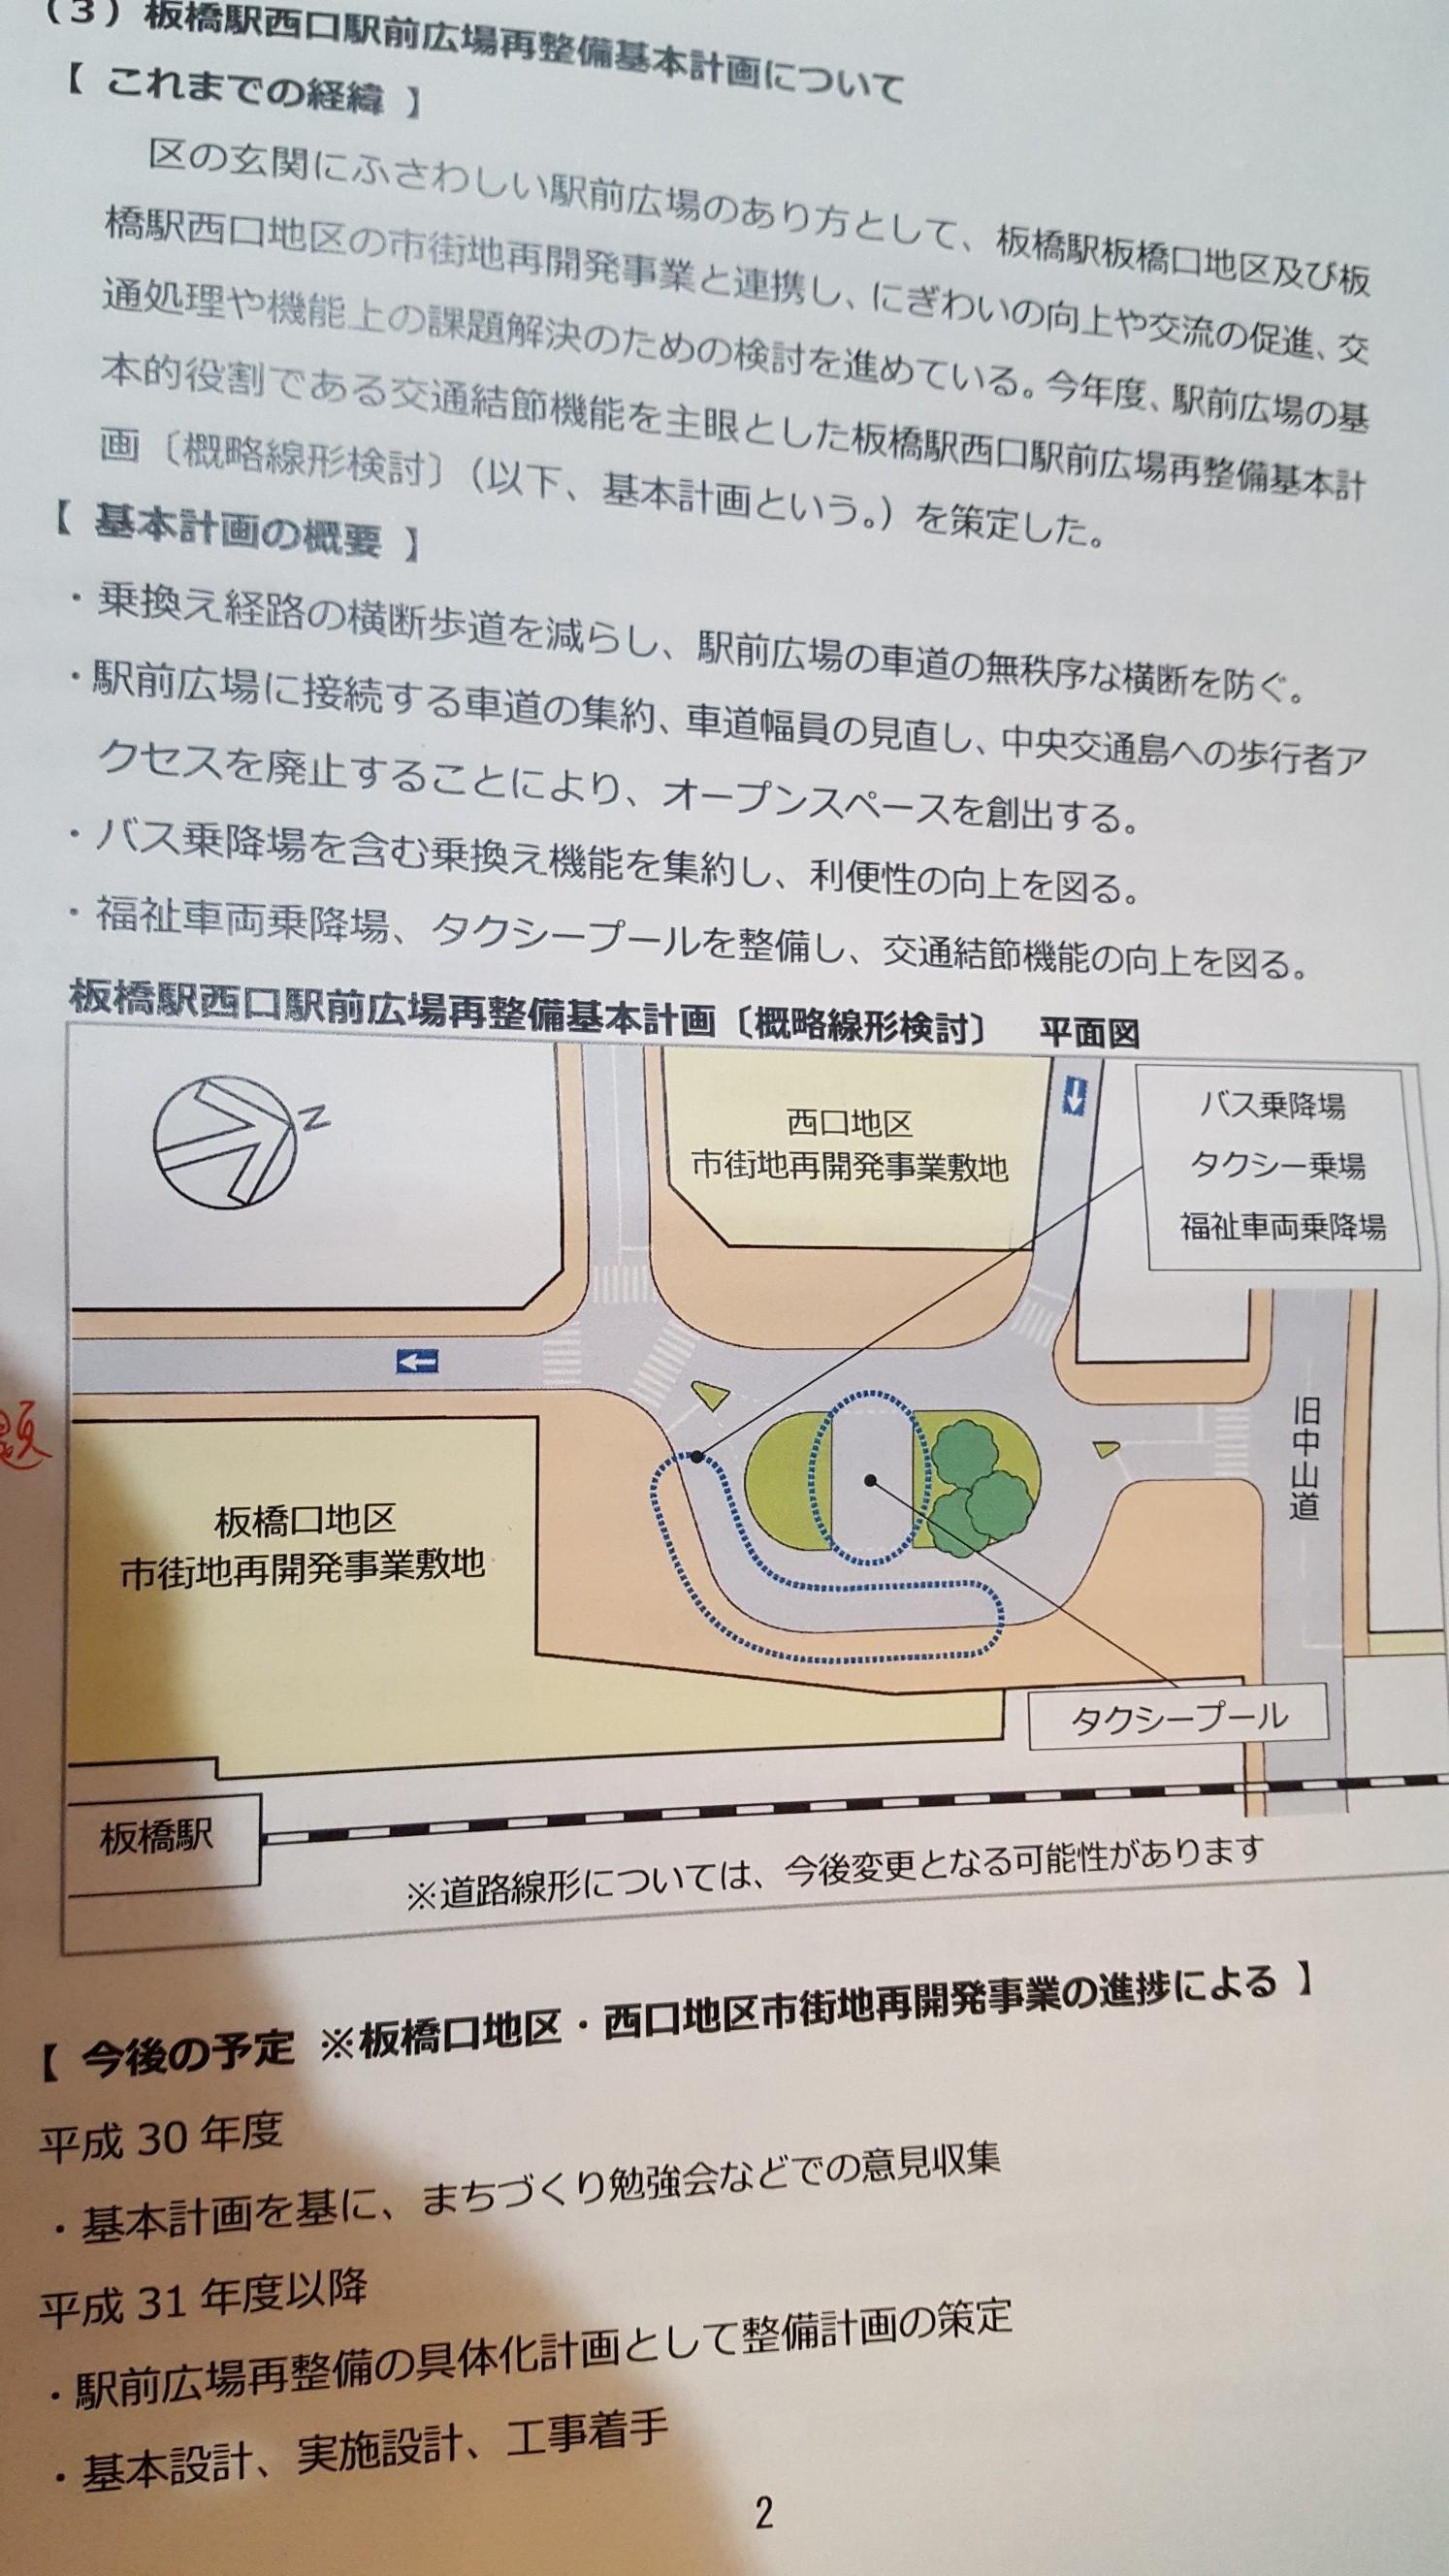 JR板橋駅広場図